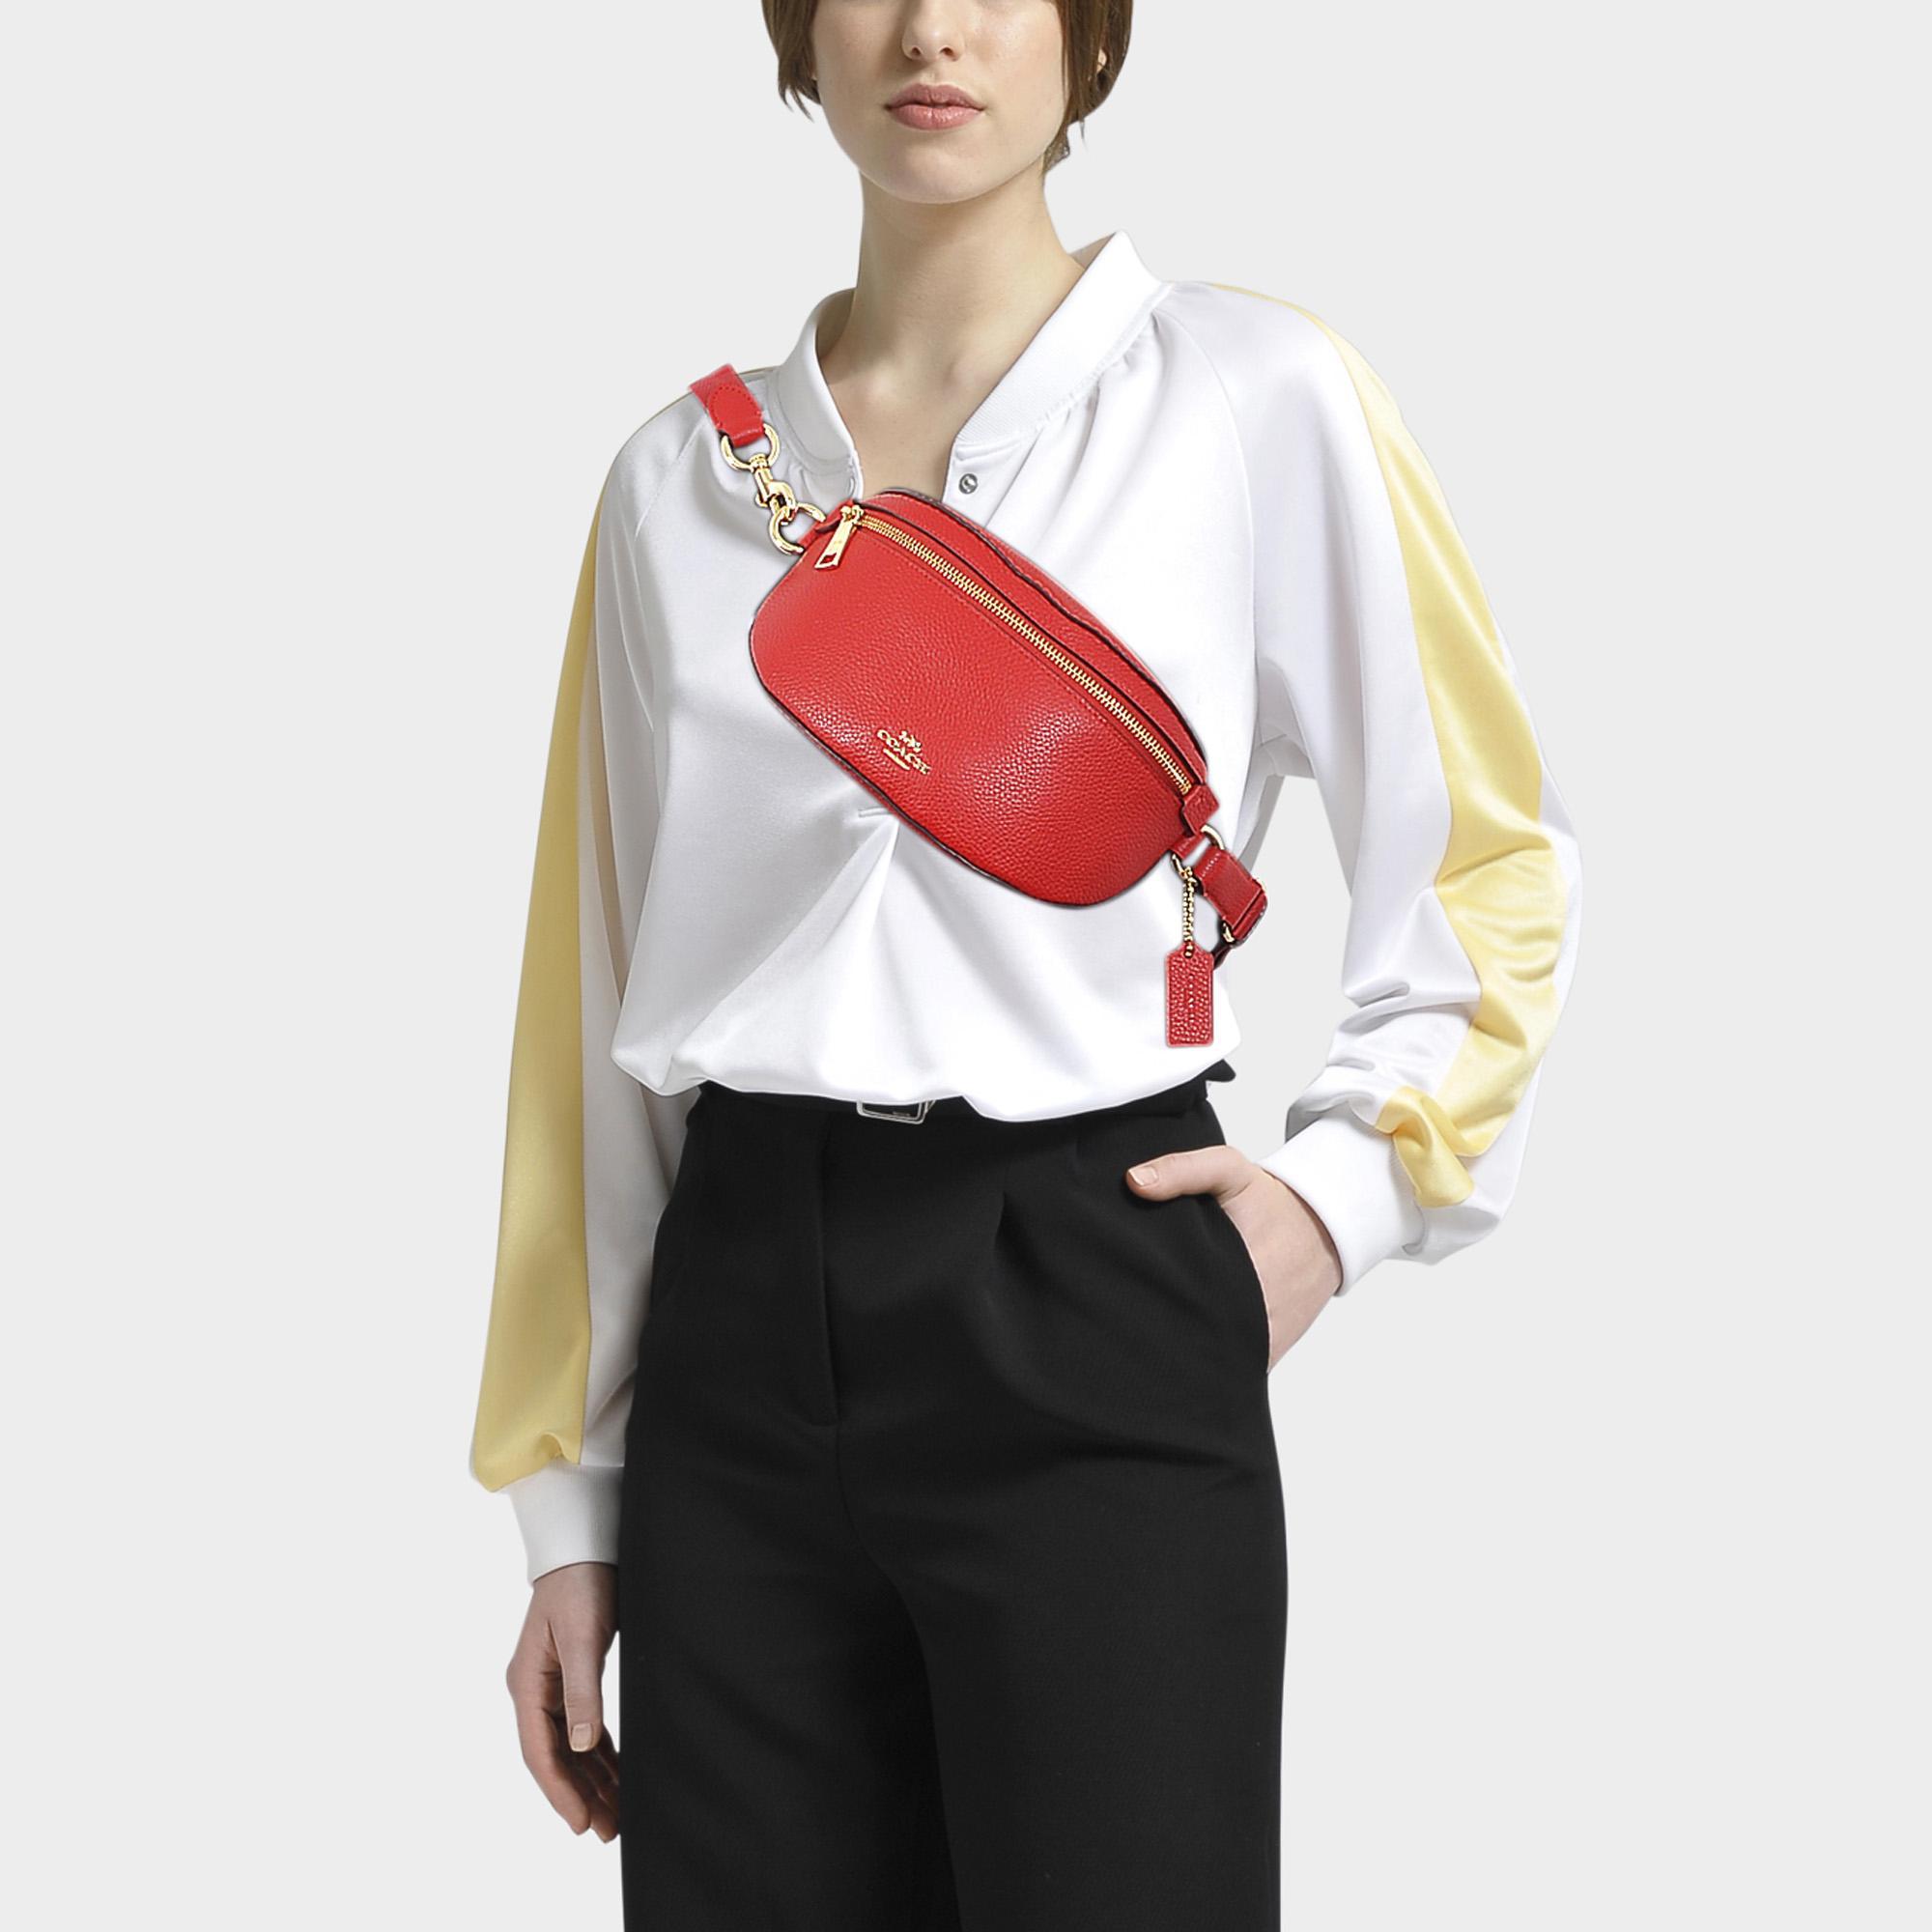 b35e75b52d36d COACH - Red Belt Bag In Jasper Polished Pebble Leather - Lyst. View  fullscreen